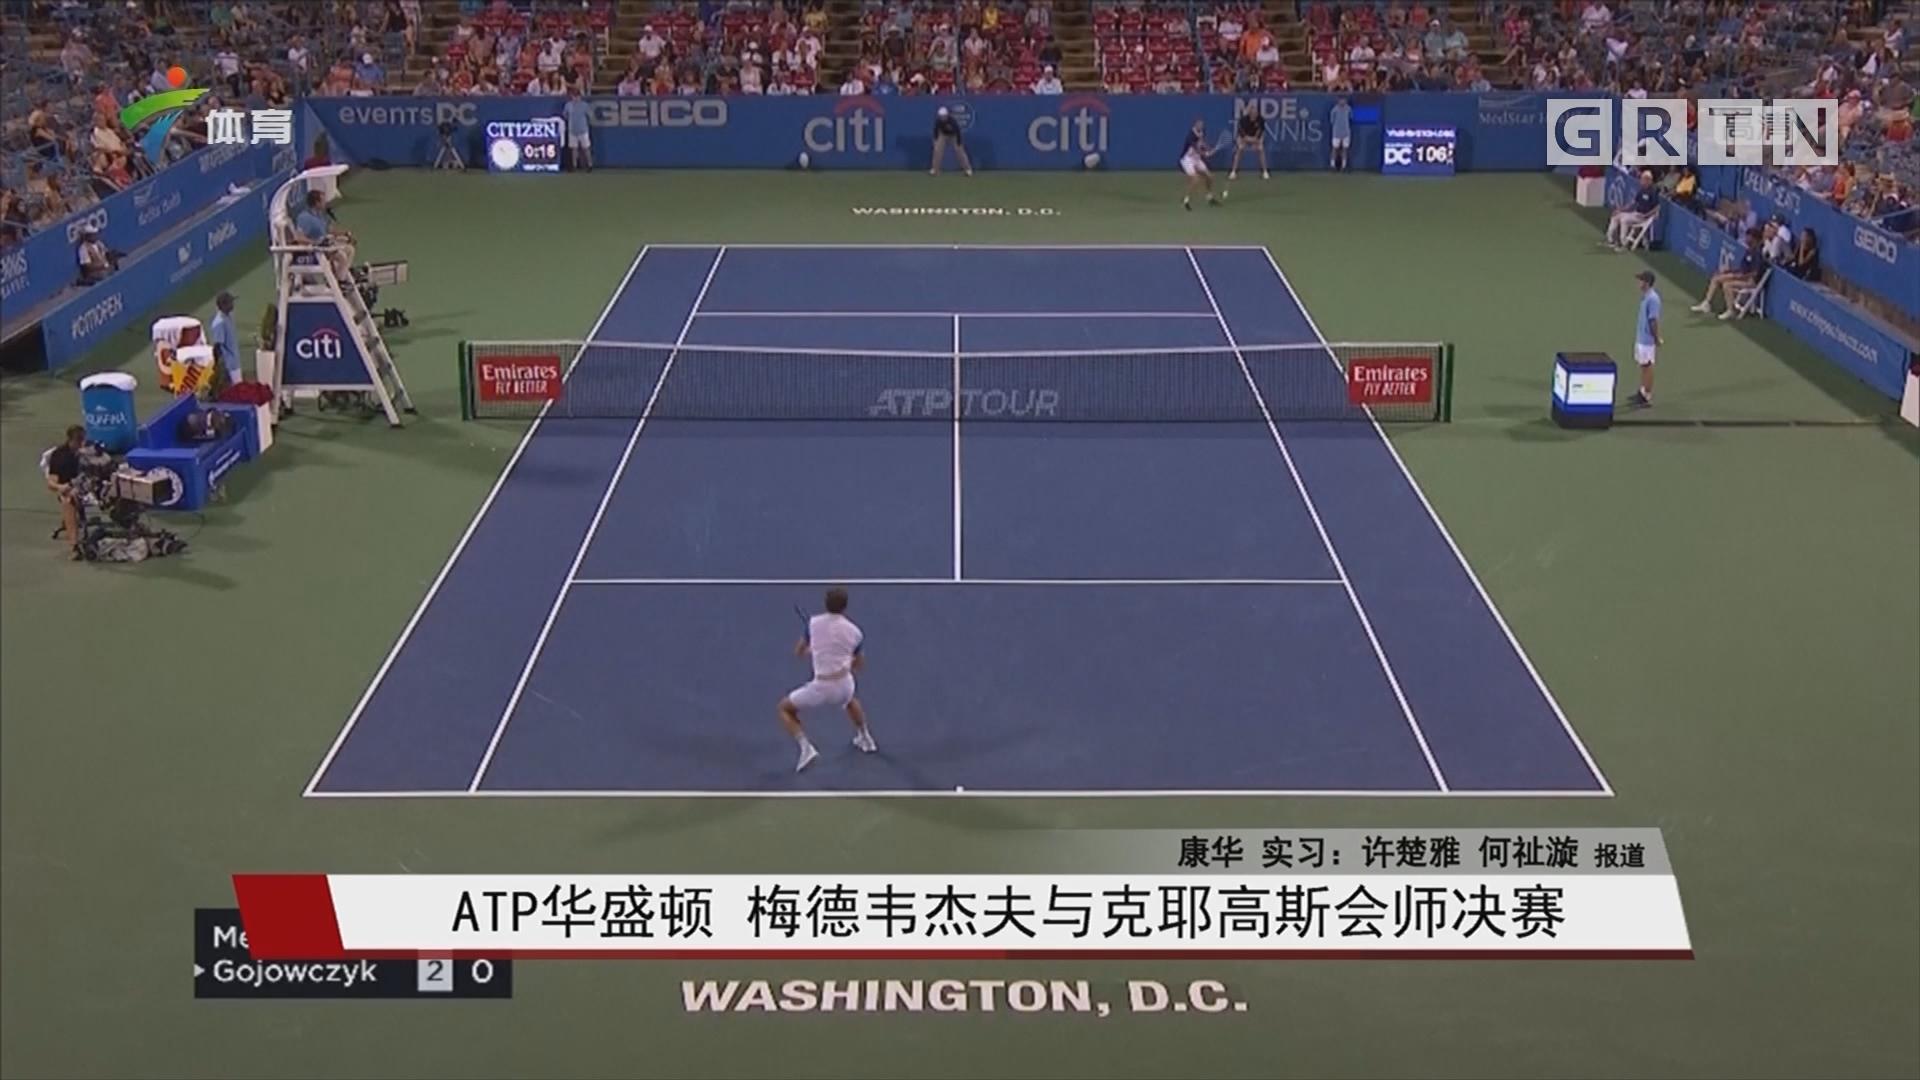 ATP华盛顿 梅德韦杰夫与克耶高斯会师决赛